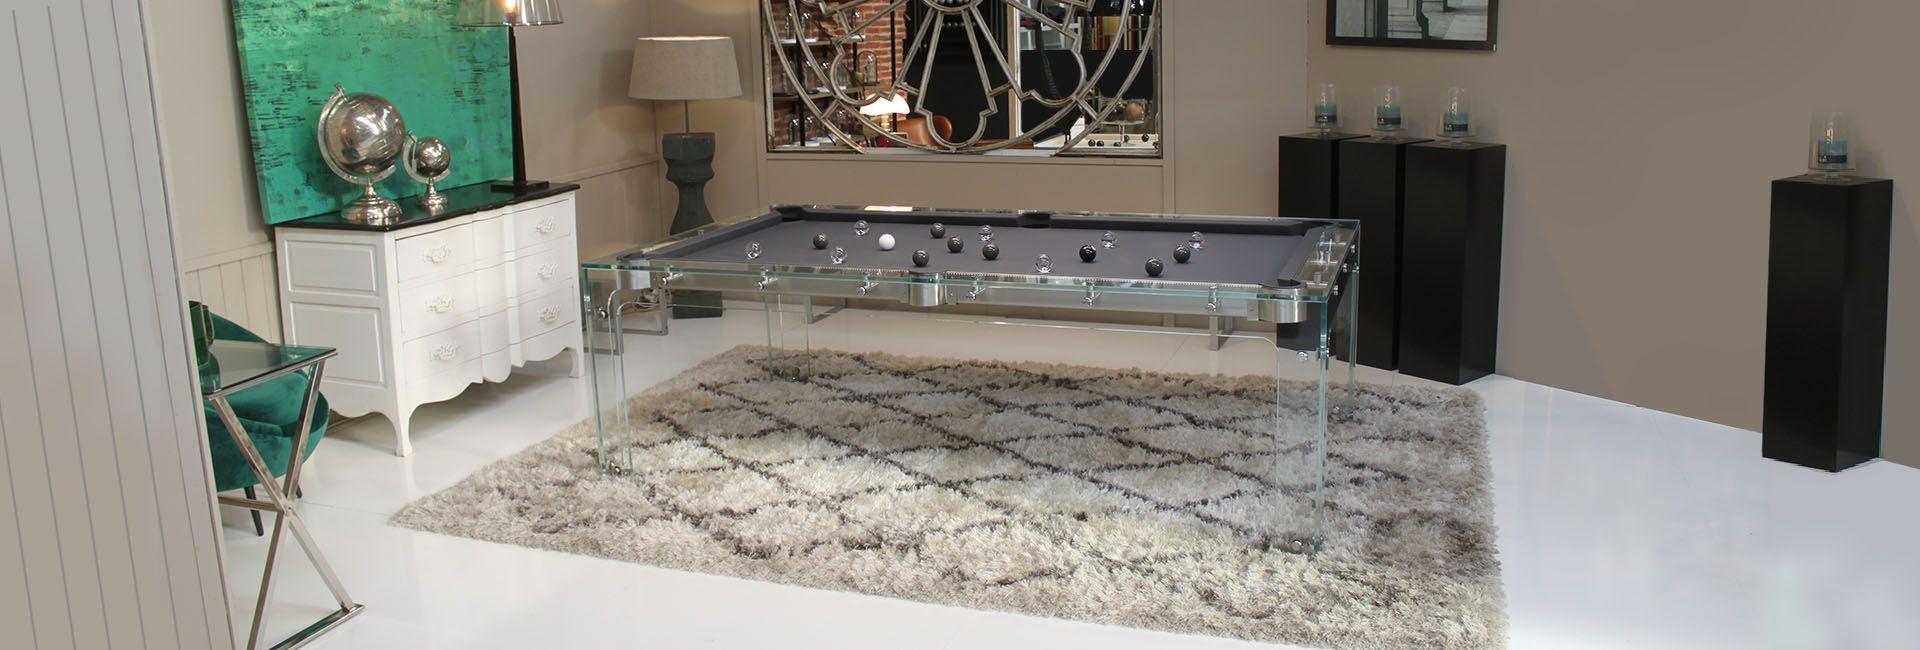 Premium billiards - Luxury billiards - Toulet billiards